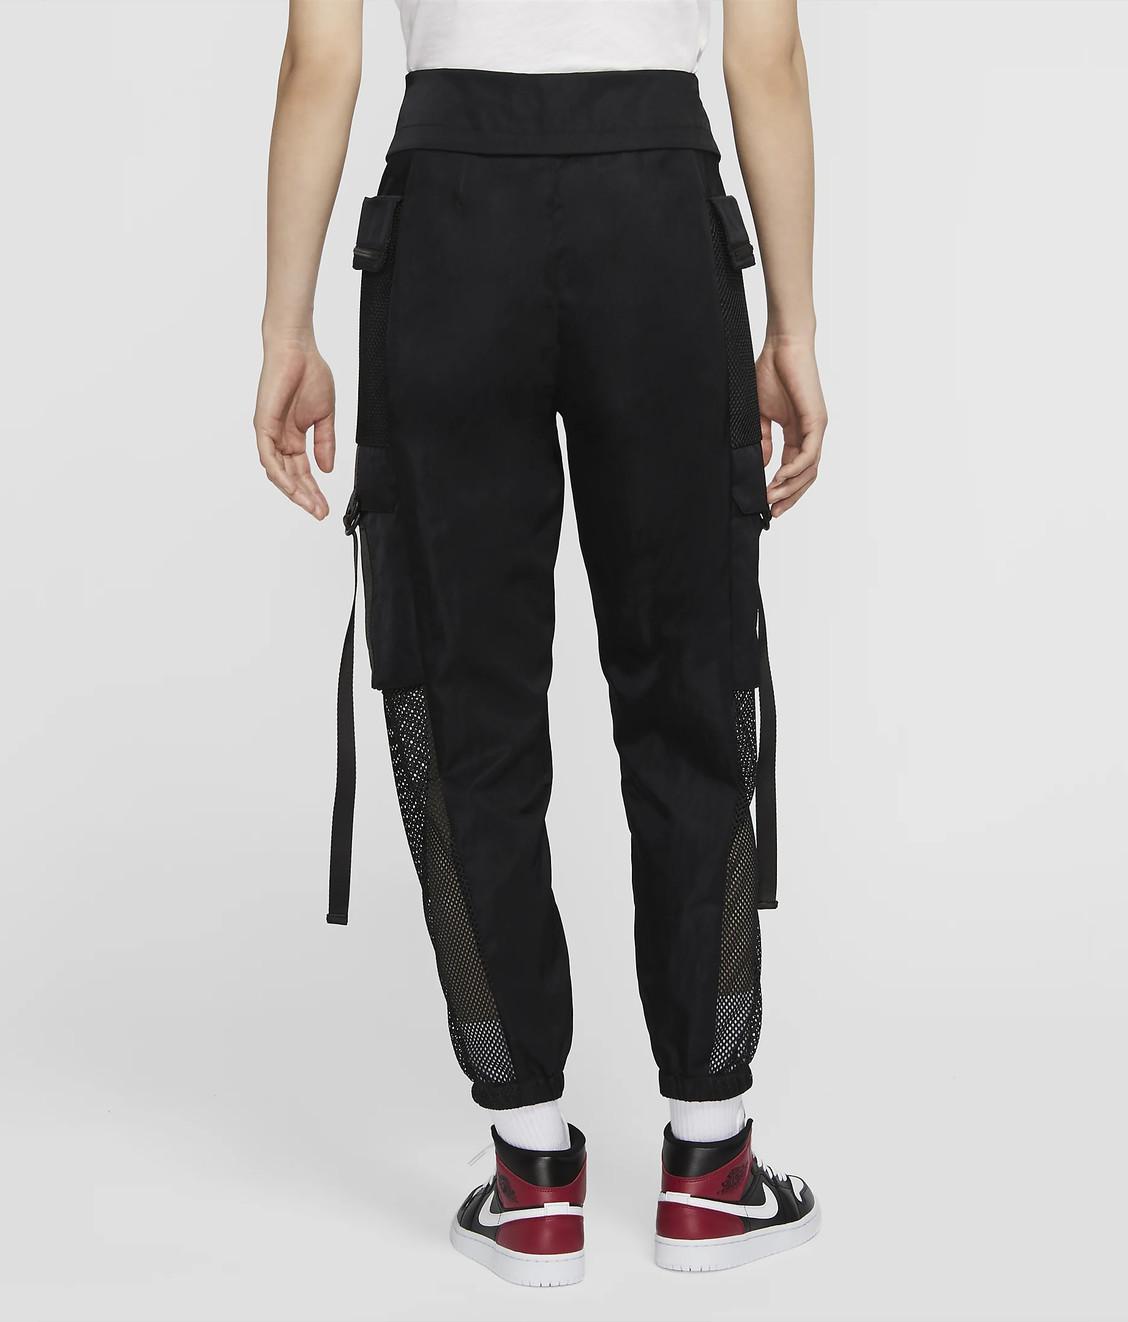 Nike Nike Jordan Utility Pant Black